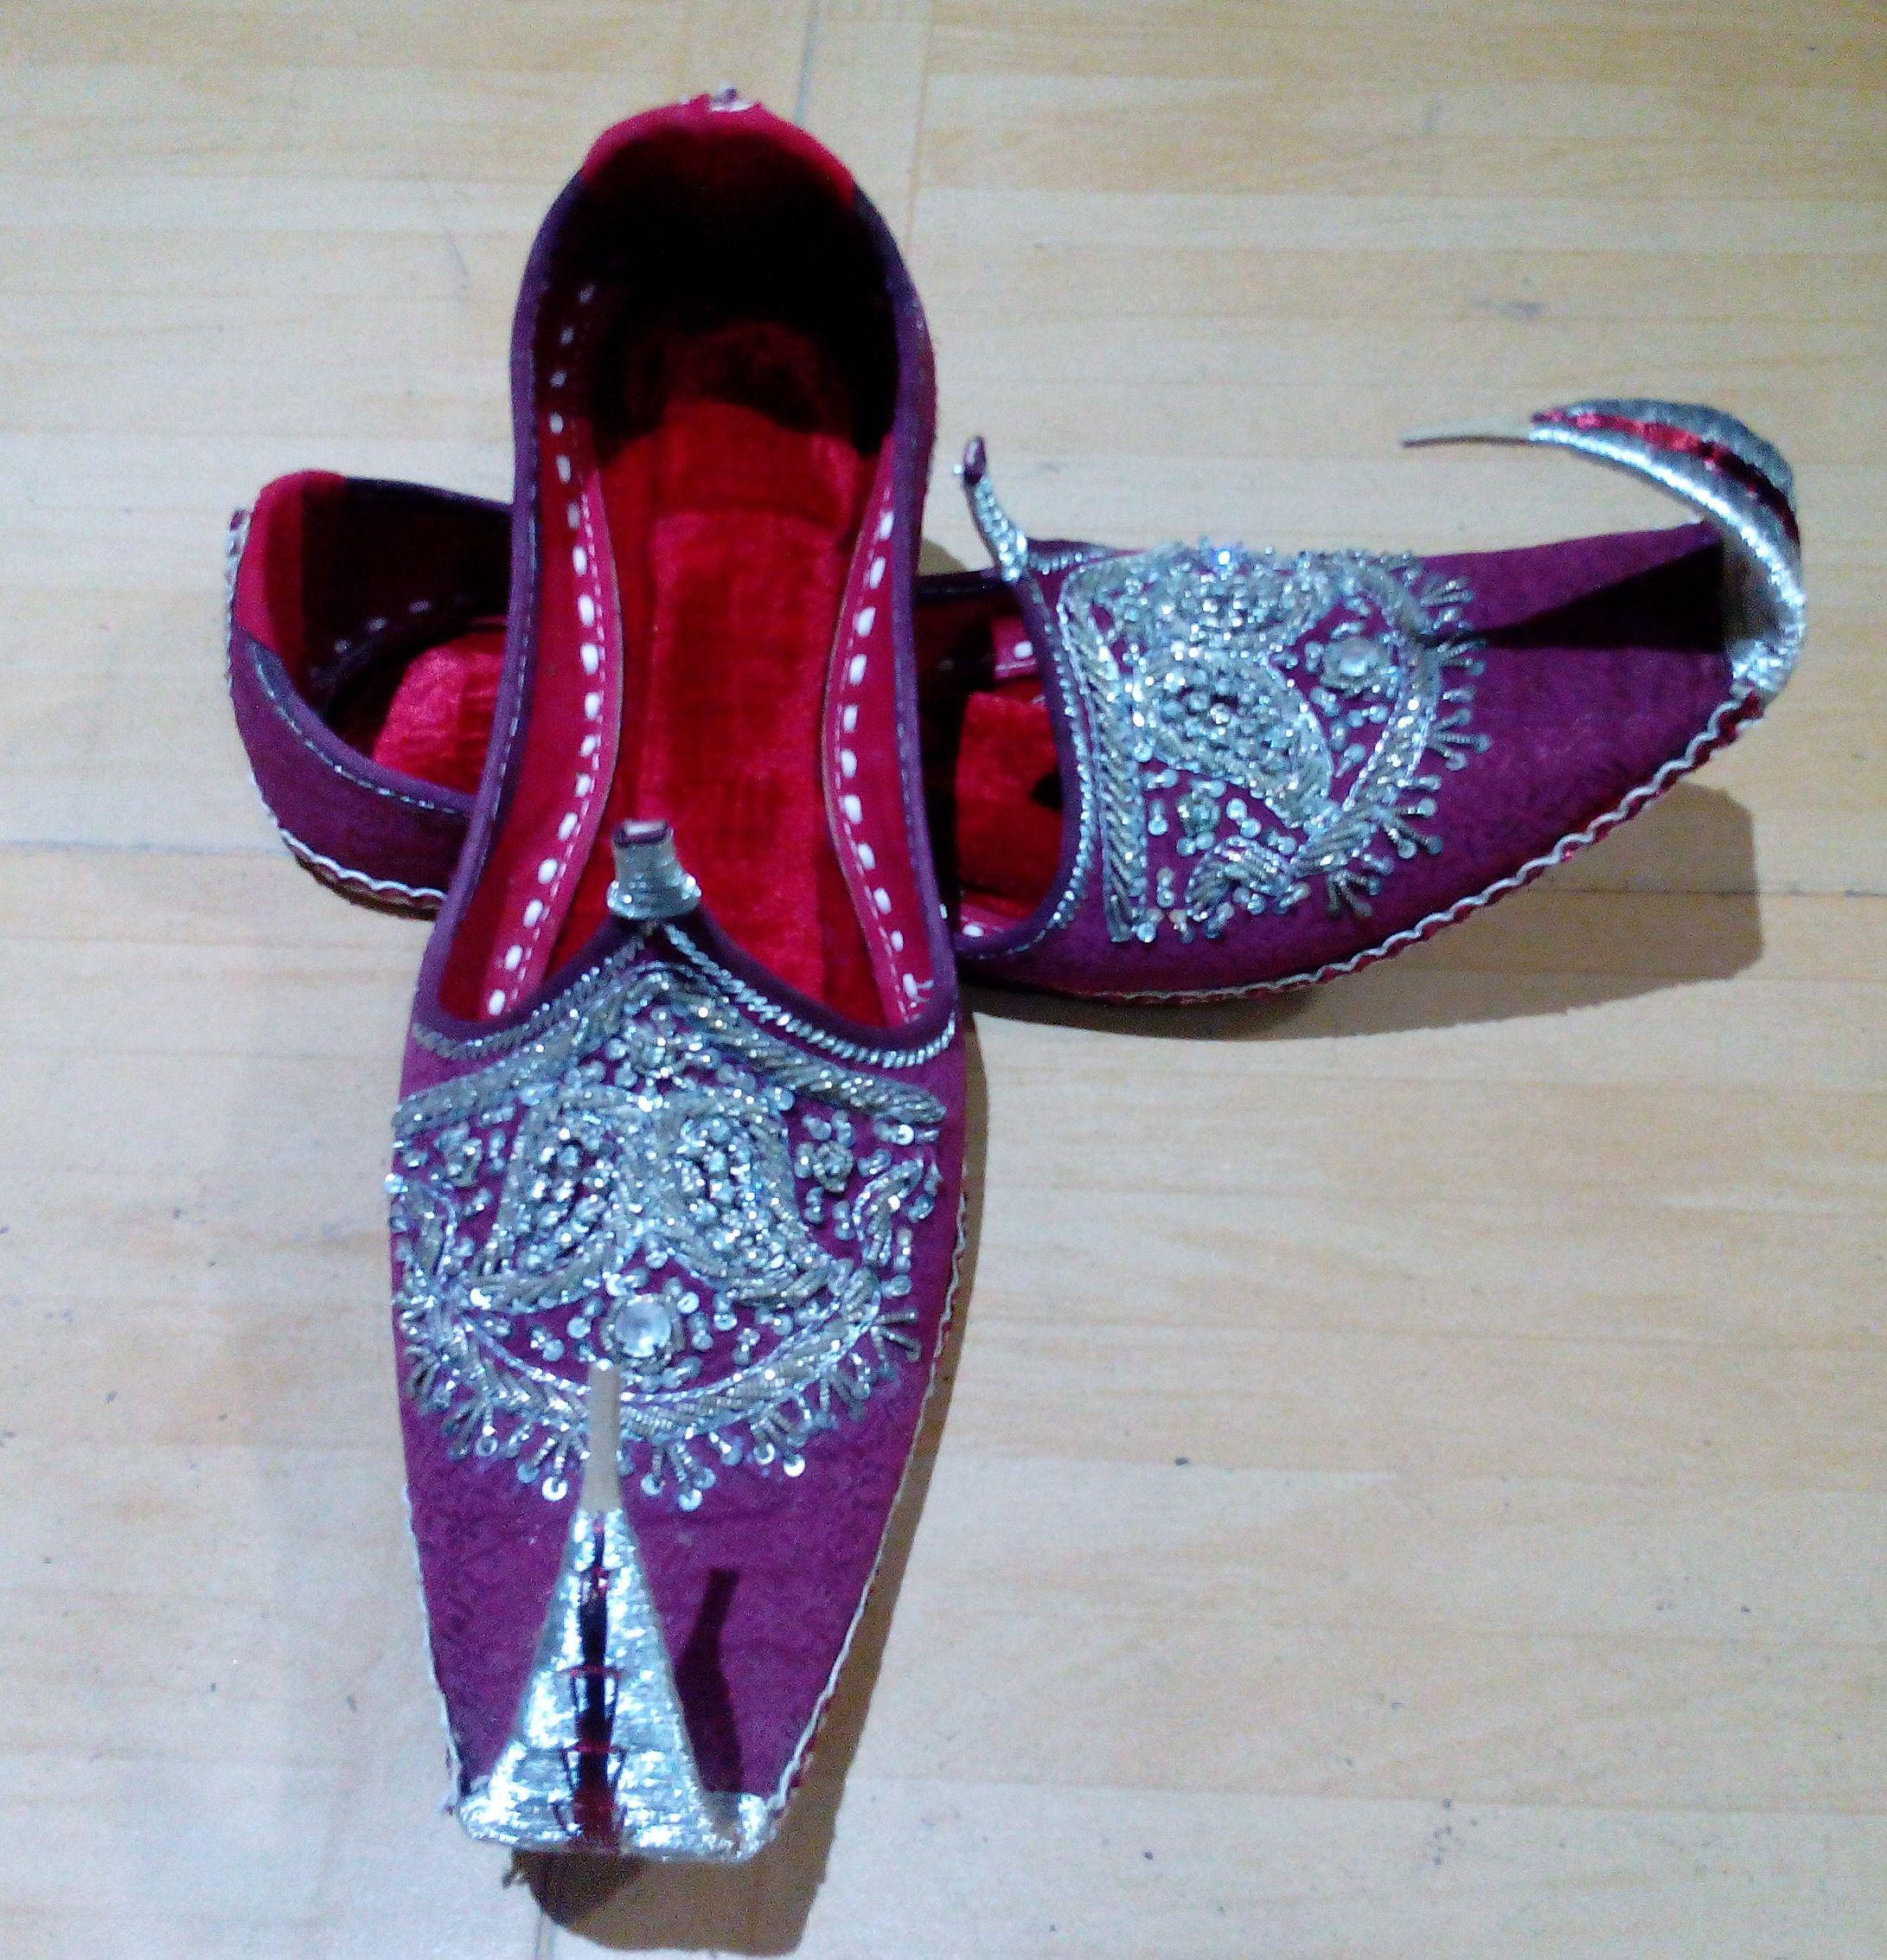 482d5d0e9 FREE SHIPPING Unisex Handmade Leather Khussa Bridal Wedding Shoes on  Storenvy